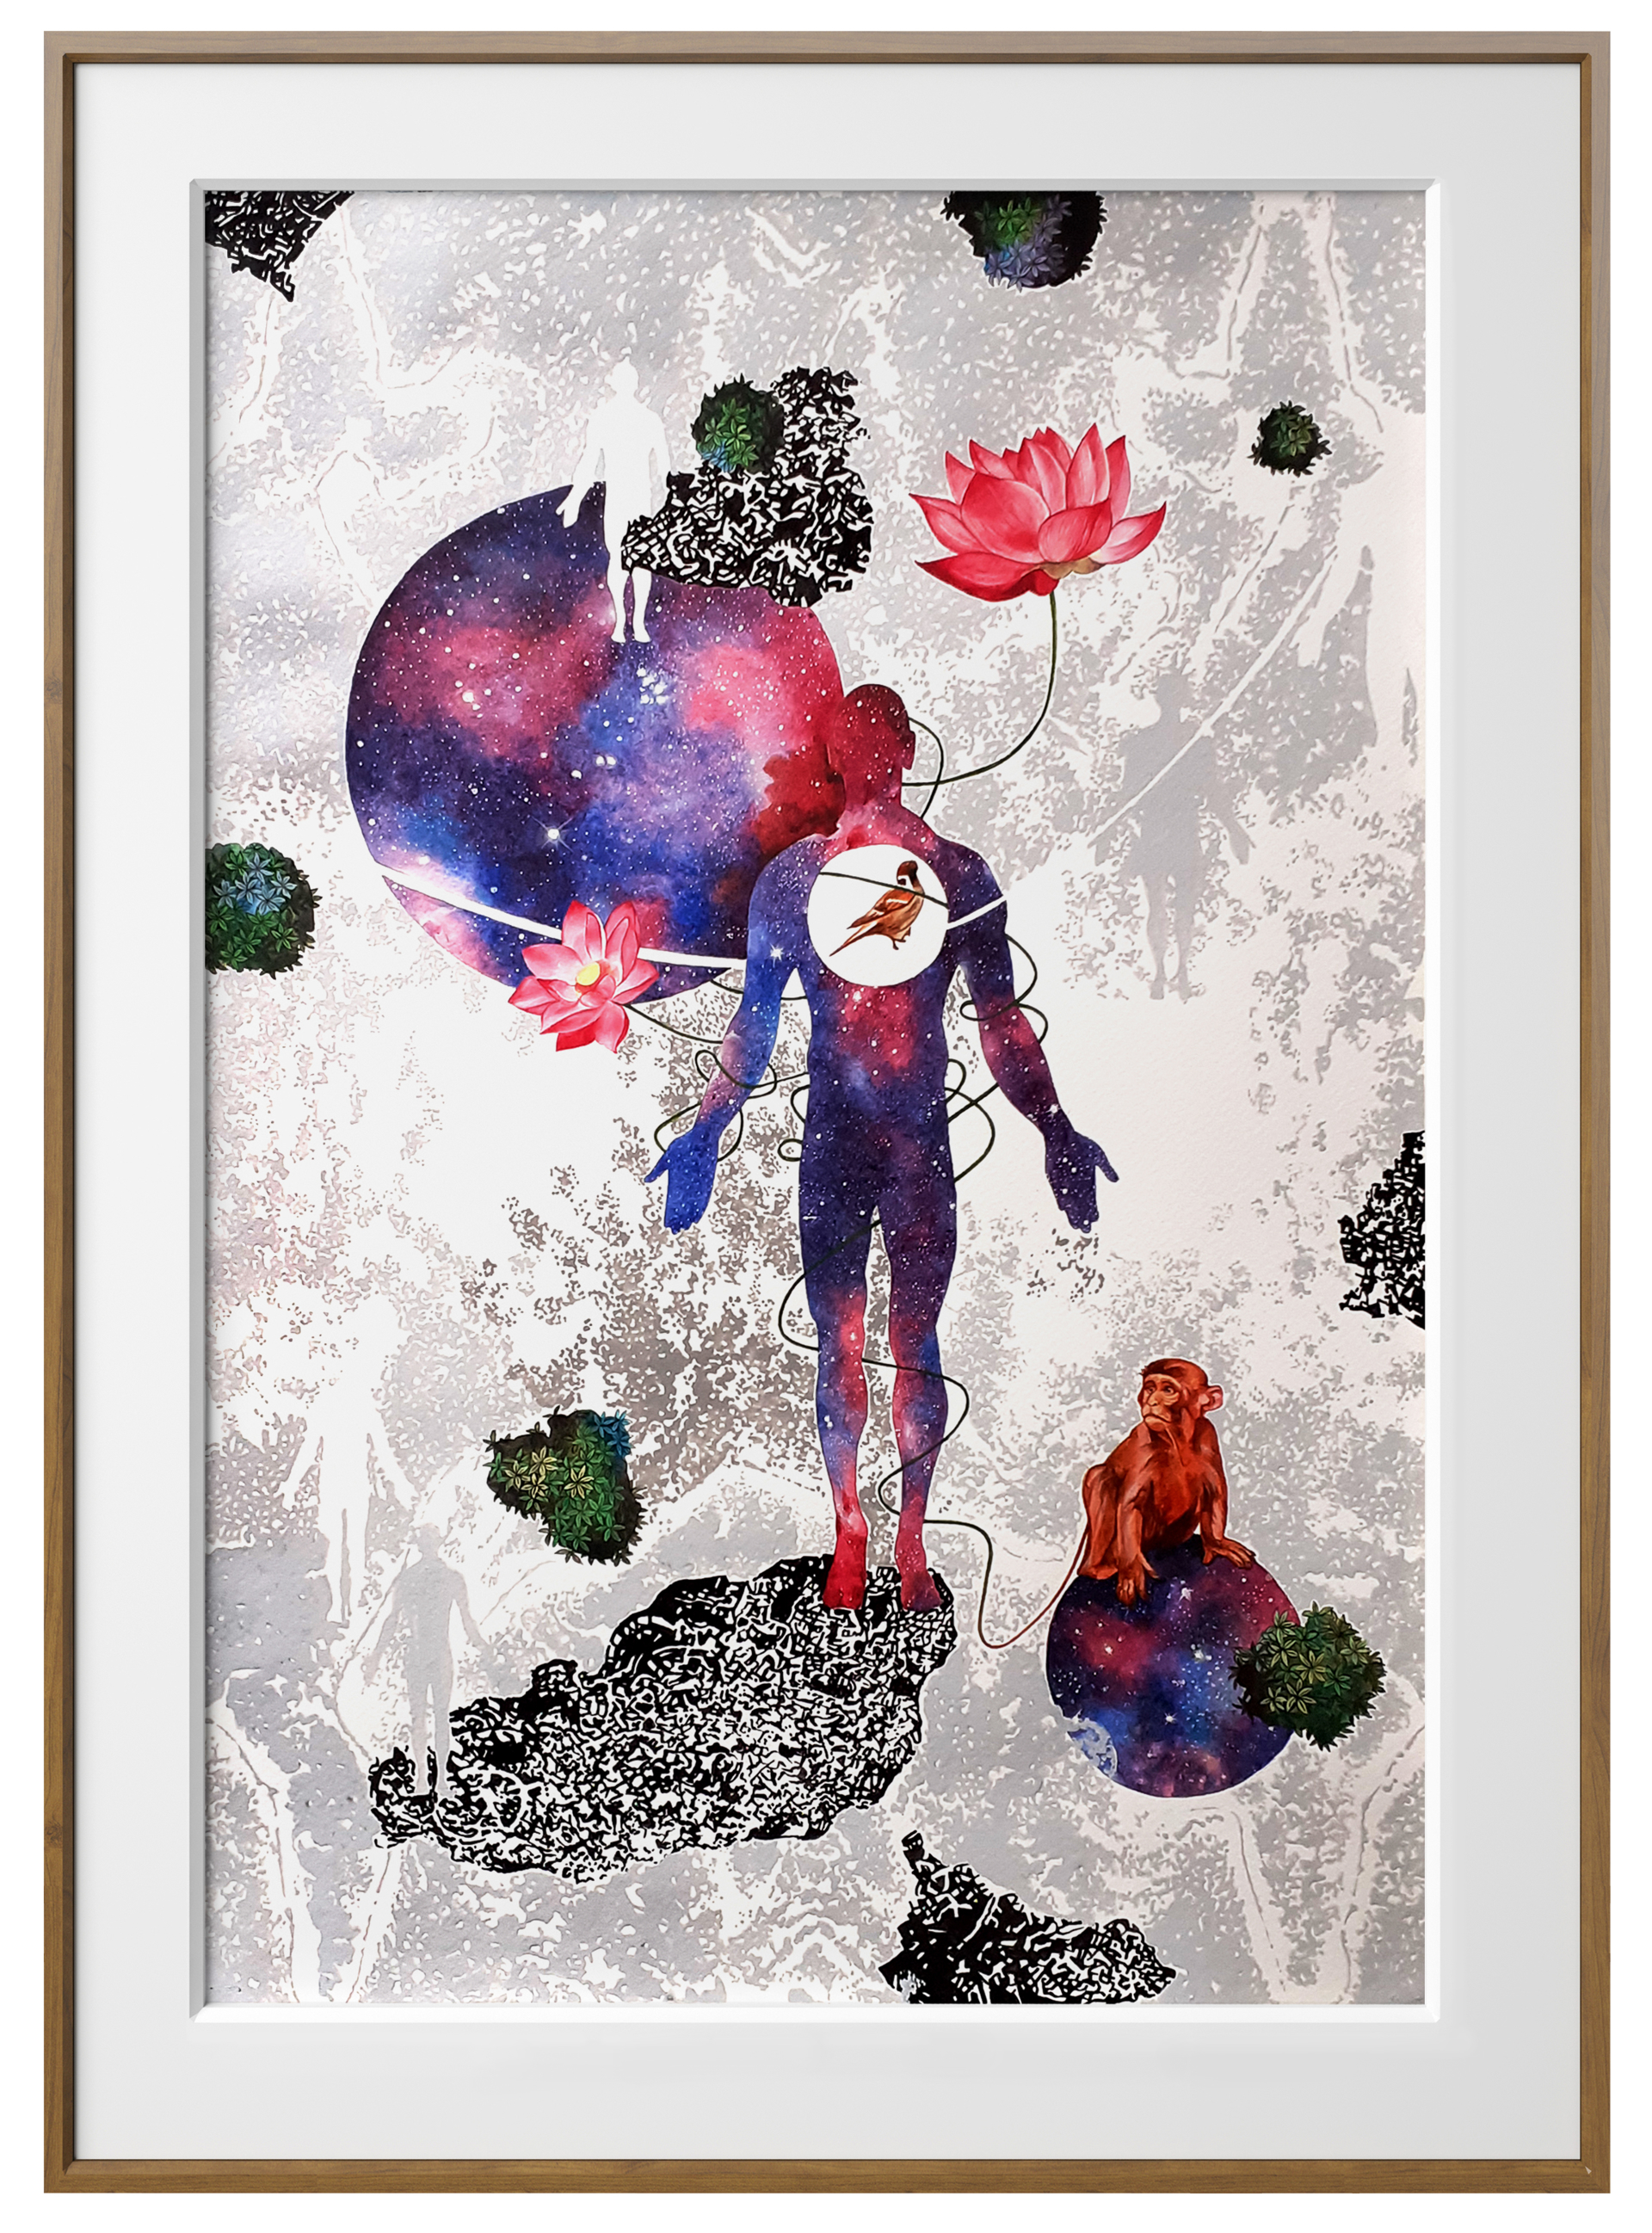 Eternal Dance of Nature by Binay Sinha